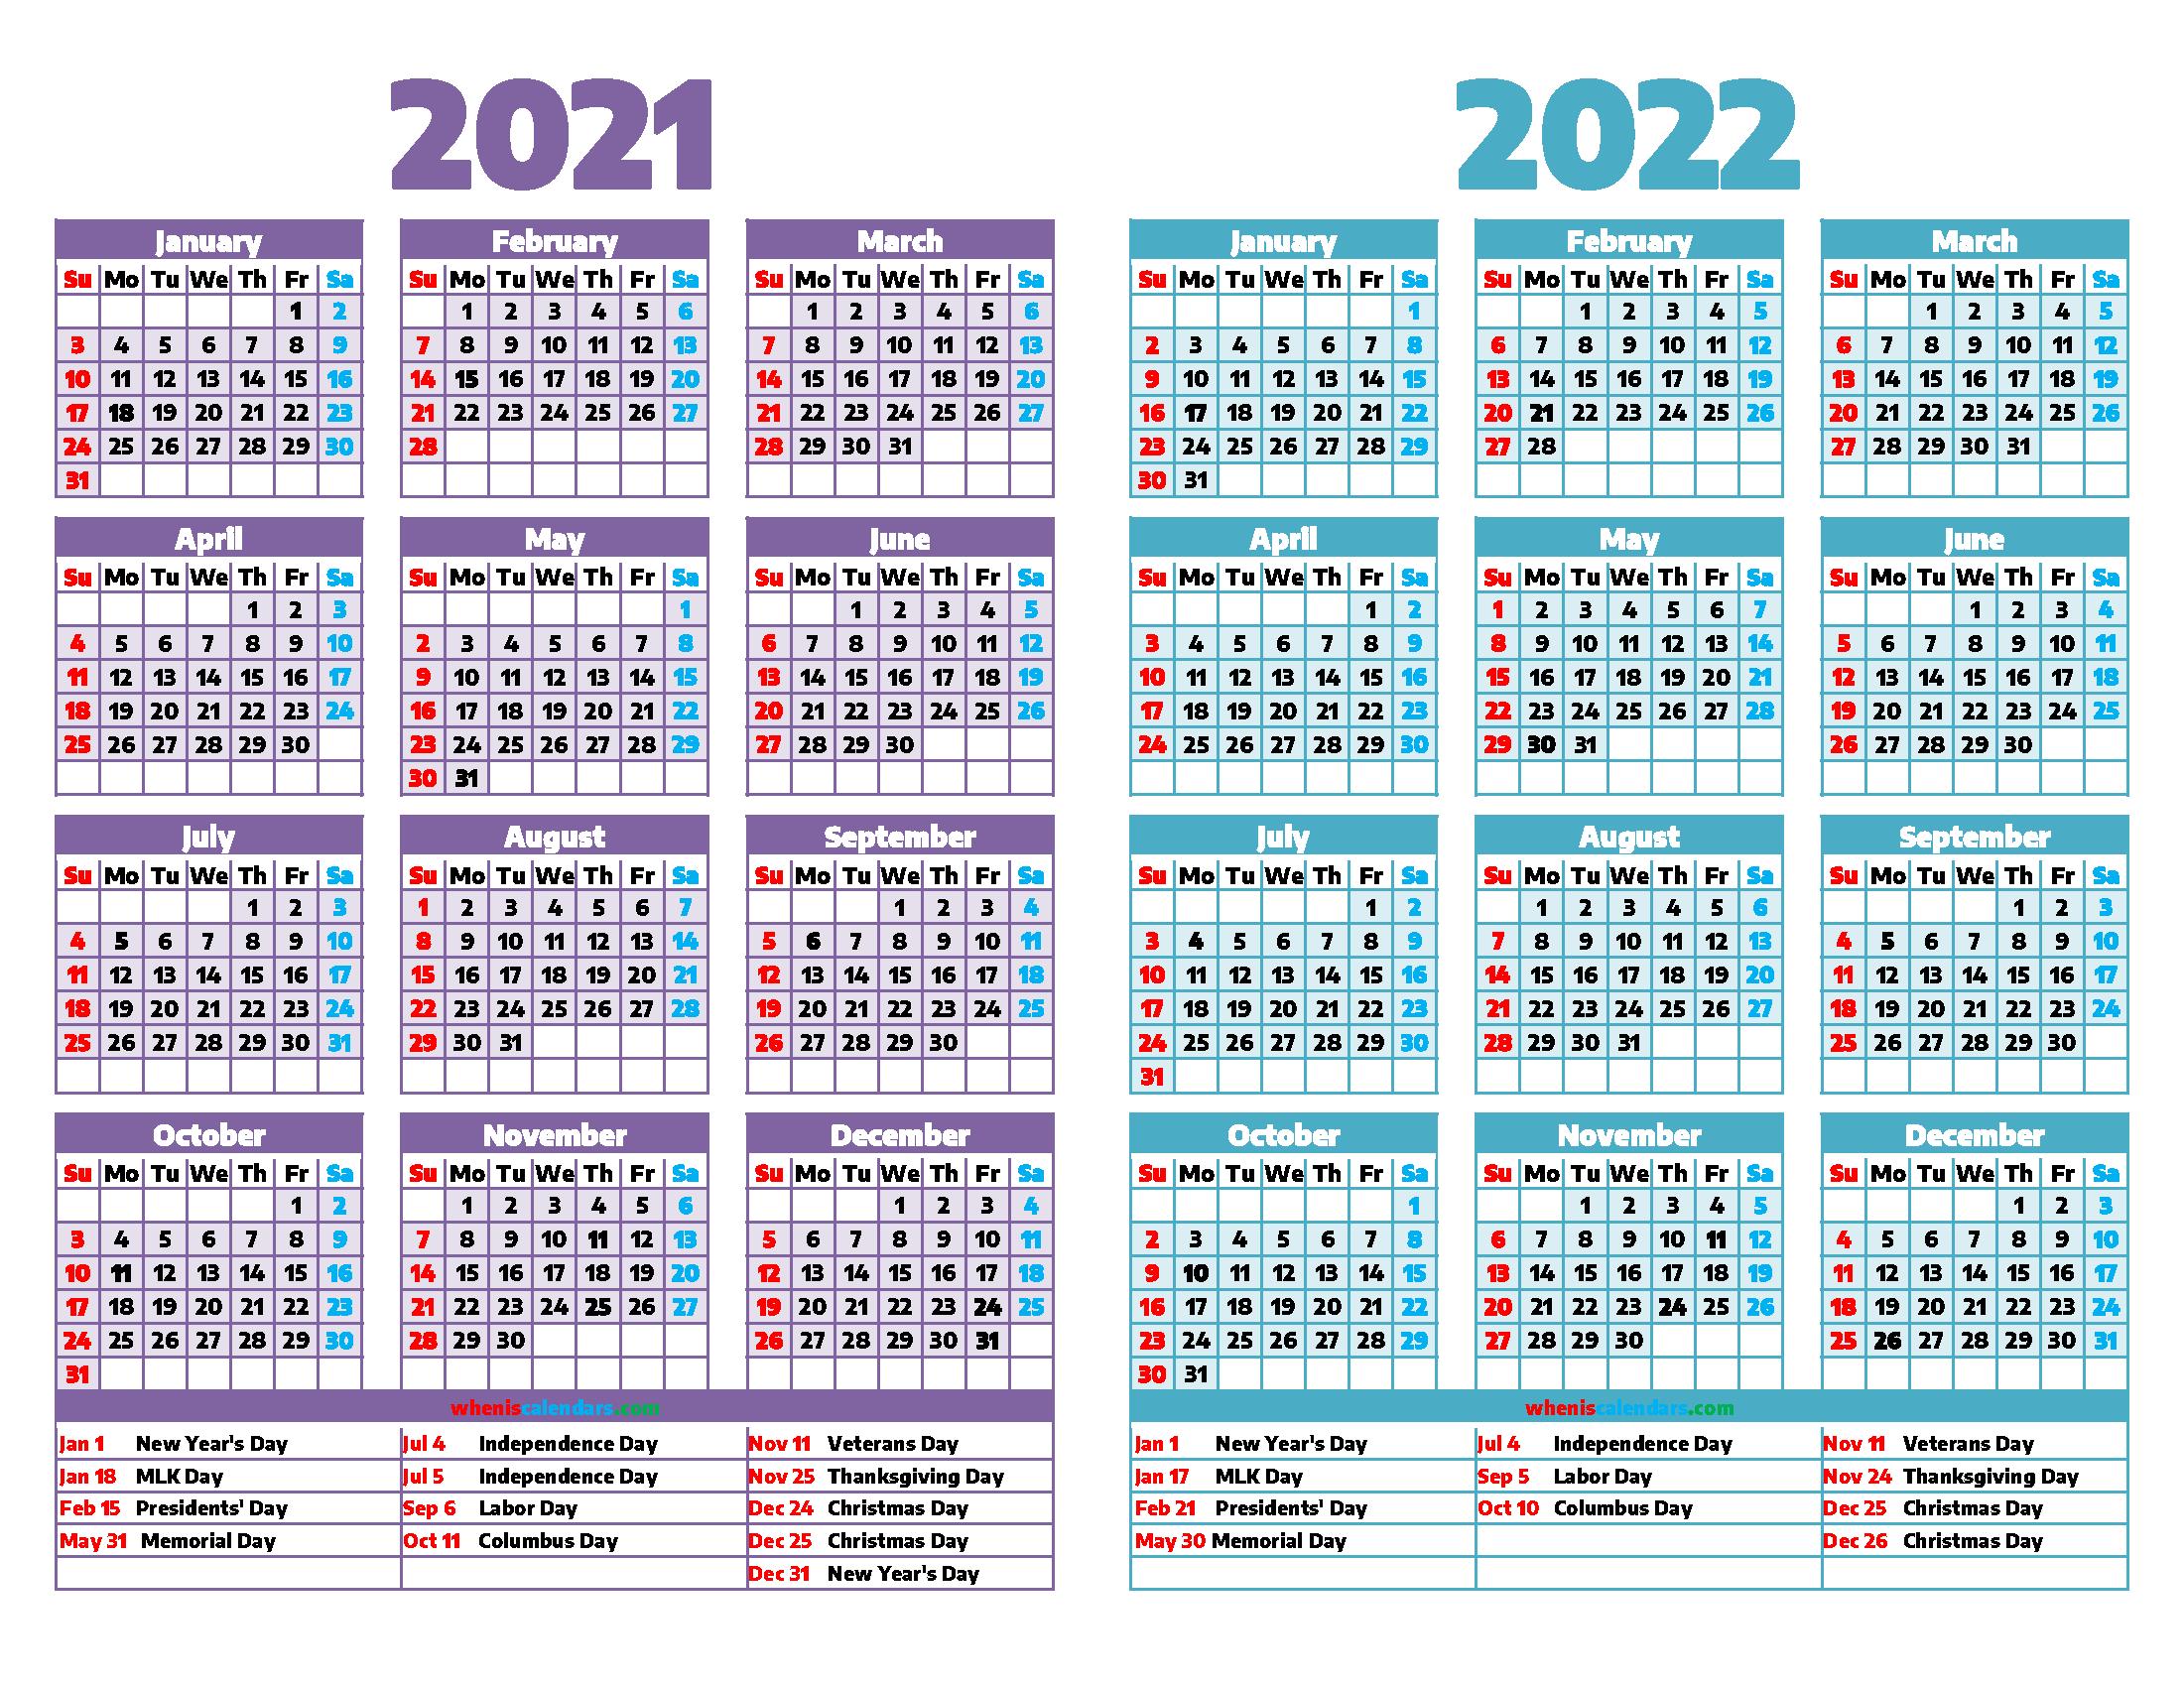 2022 Christian Calendar.2021 And 2022 Calendar Printable 12 Templates Calendar Printables Printable Calendar Template Calendar Template